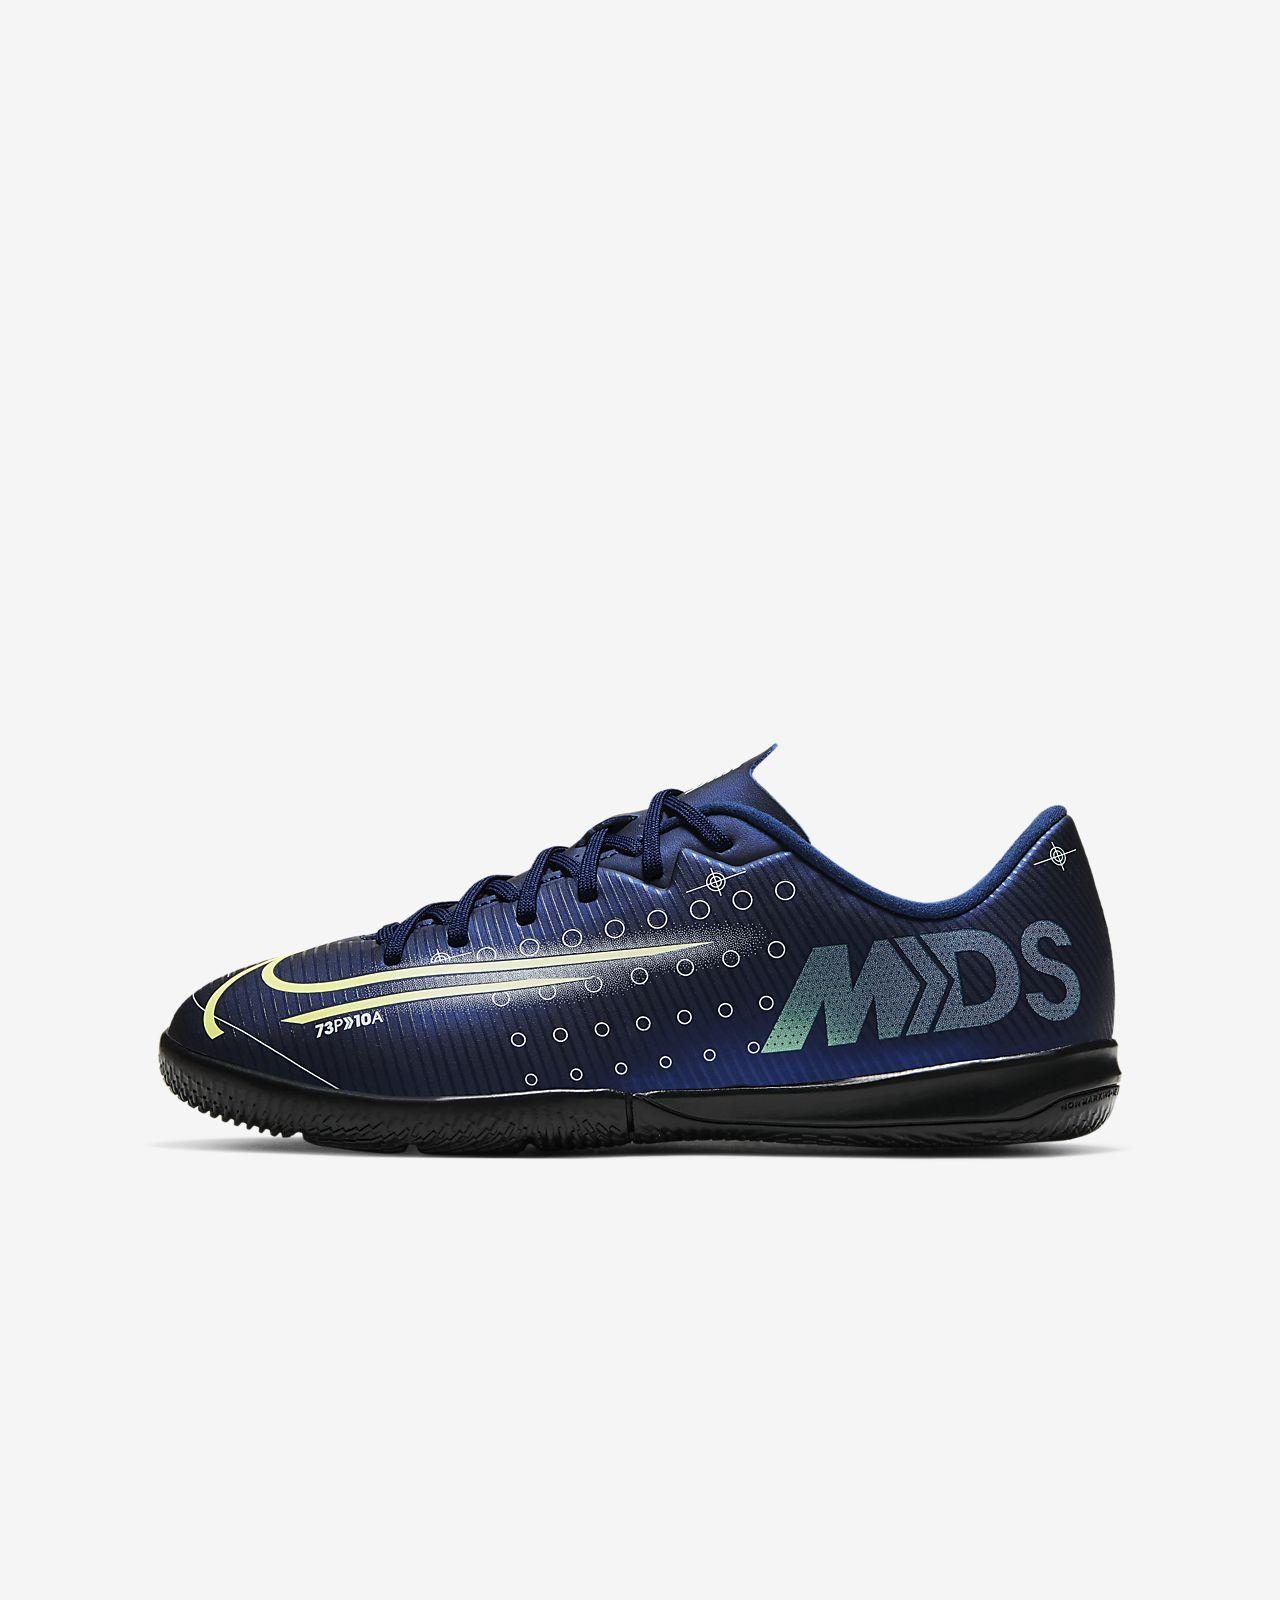 Nike Jr Mercurial Vapor 13 Academy Mds Ic Fussballschuh Fur Hallen Und Hartplatze Fur Jungere Altere Kinder